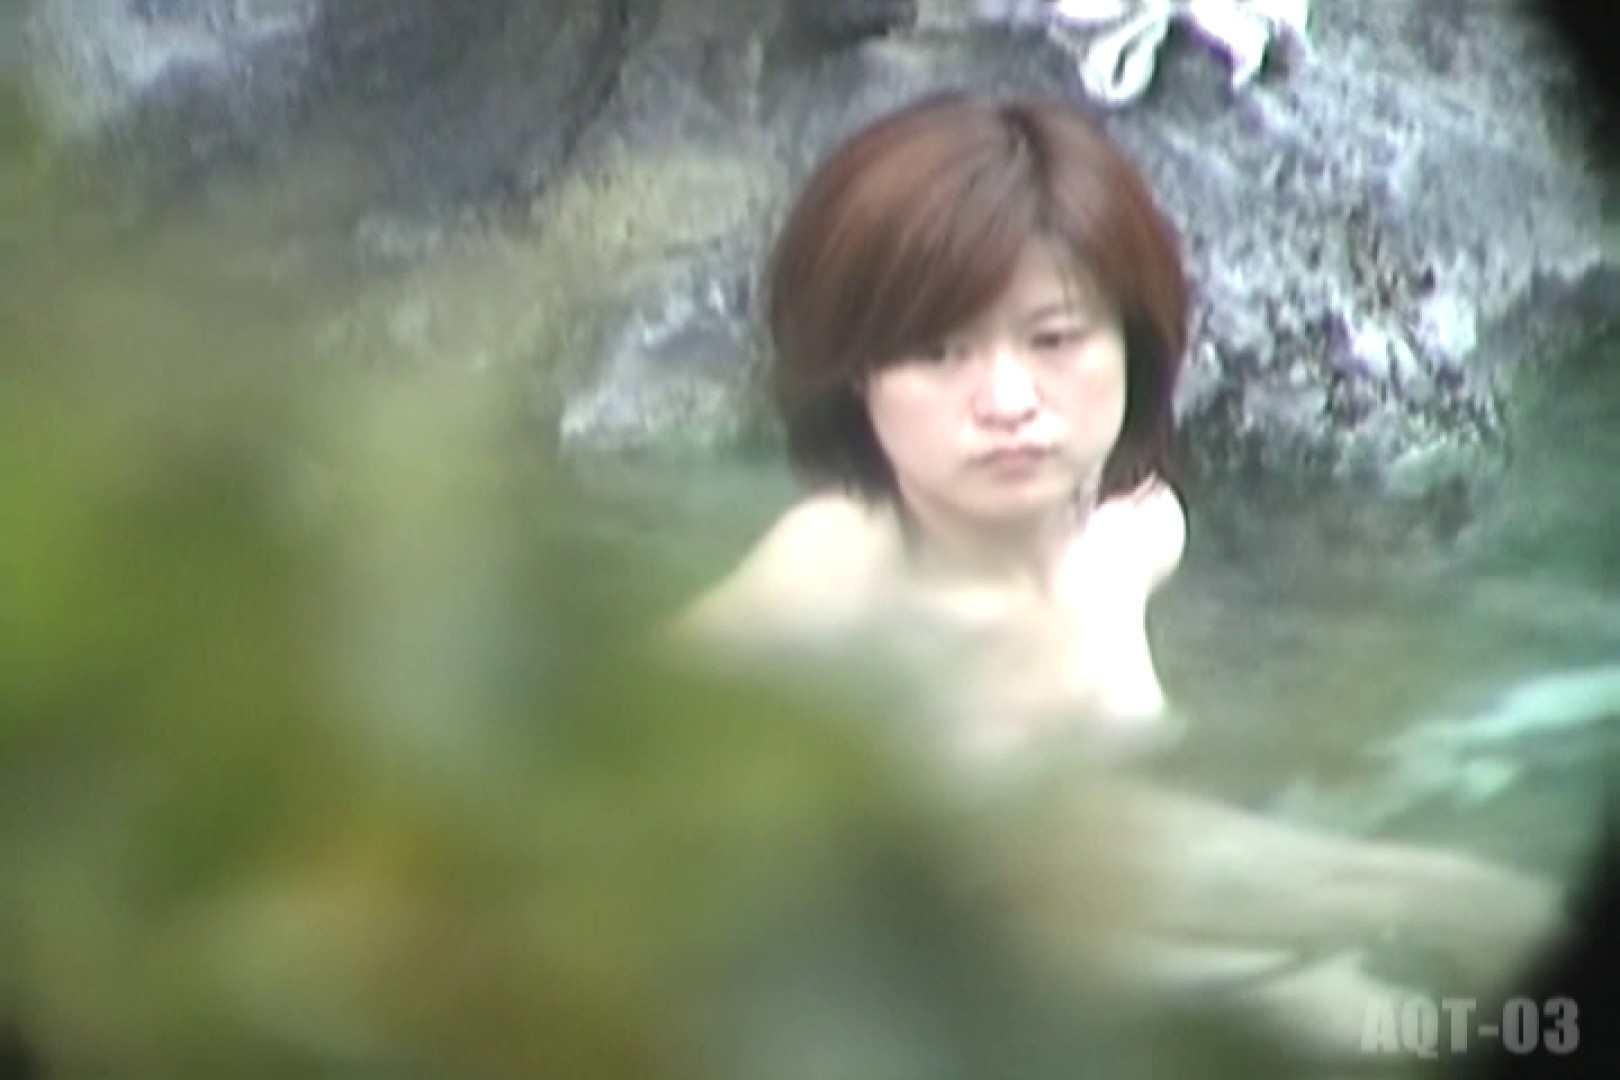 Aquaな露天風呂Vol.731 女体盗撮 盗撮おめこ無修正動画無料 96連発 14